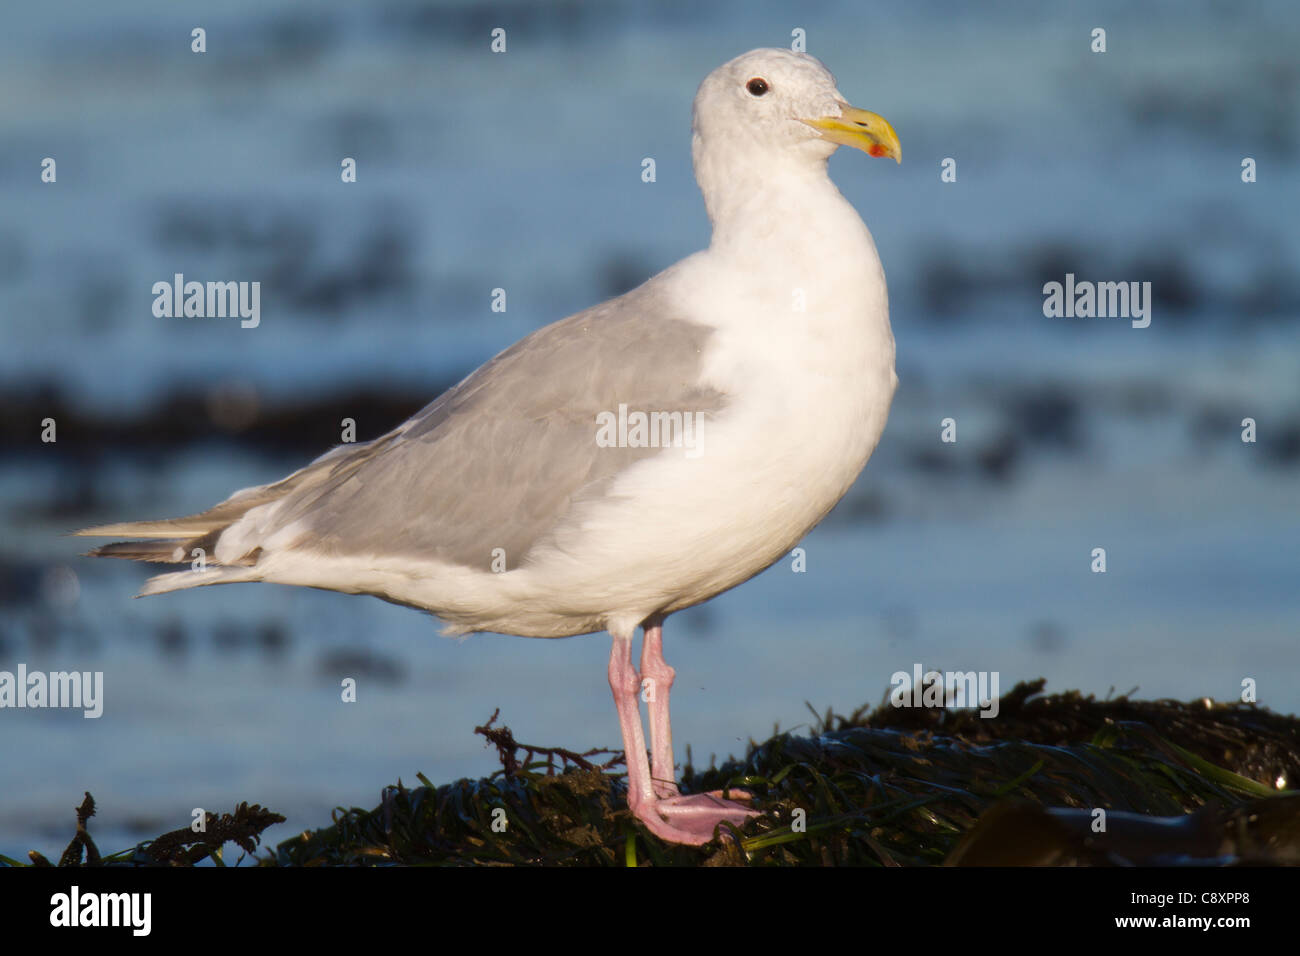 Adult Glaucous-winged Gull (Larus glaucescens) standing on shoreline - Stock Image